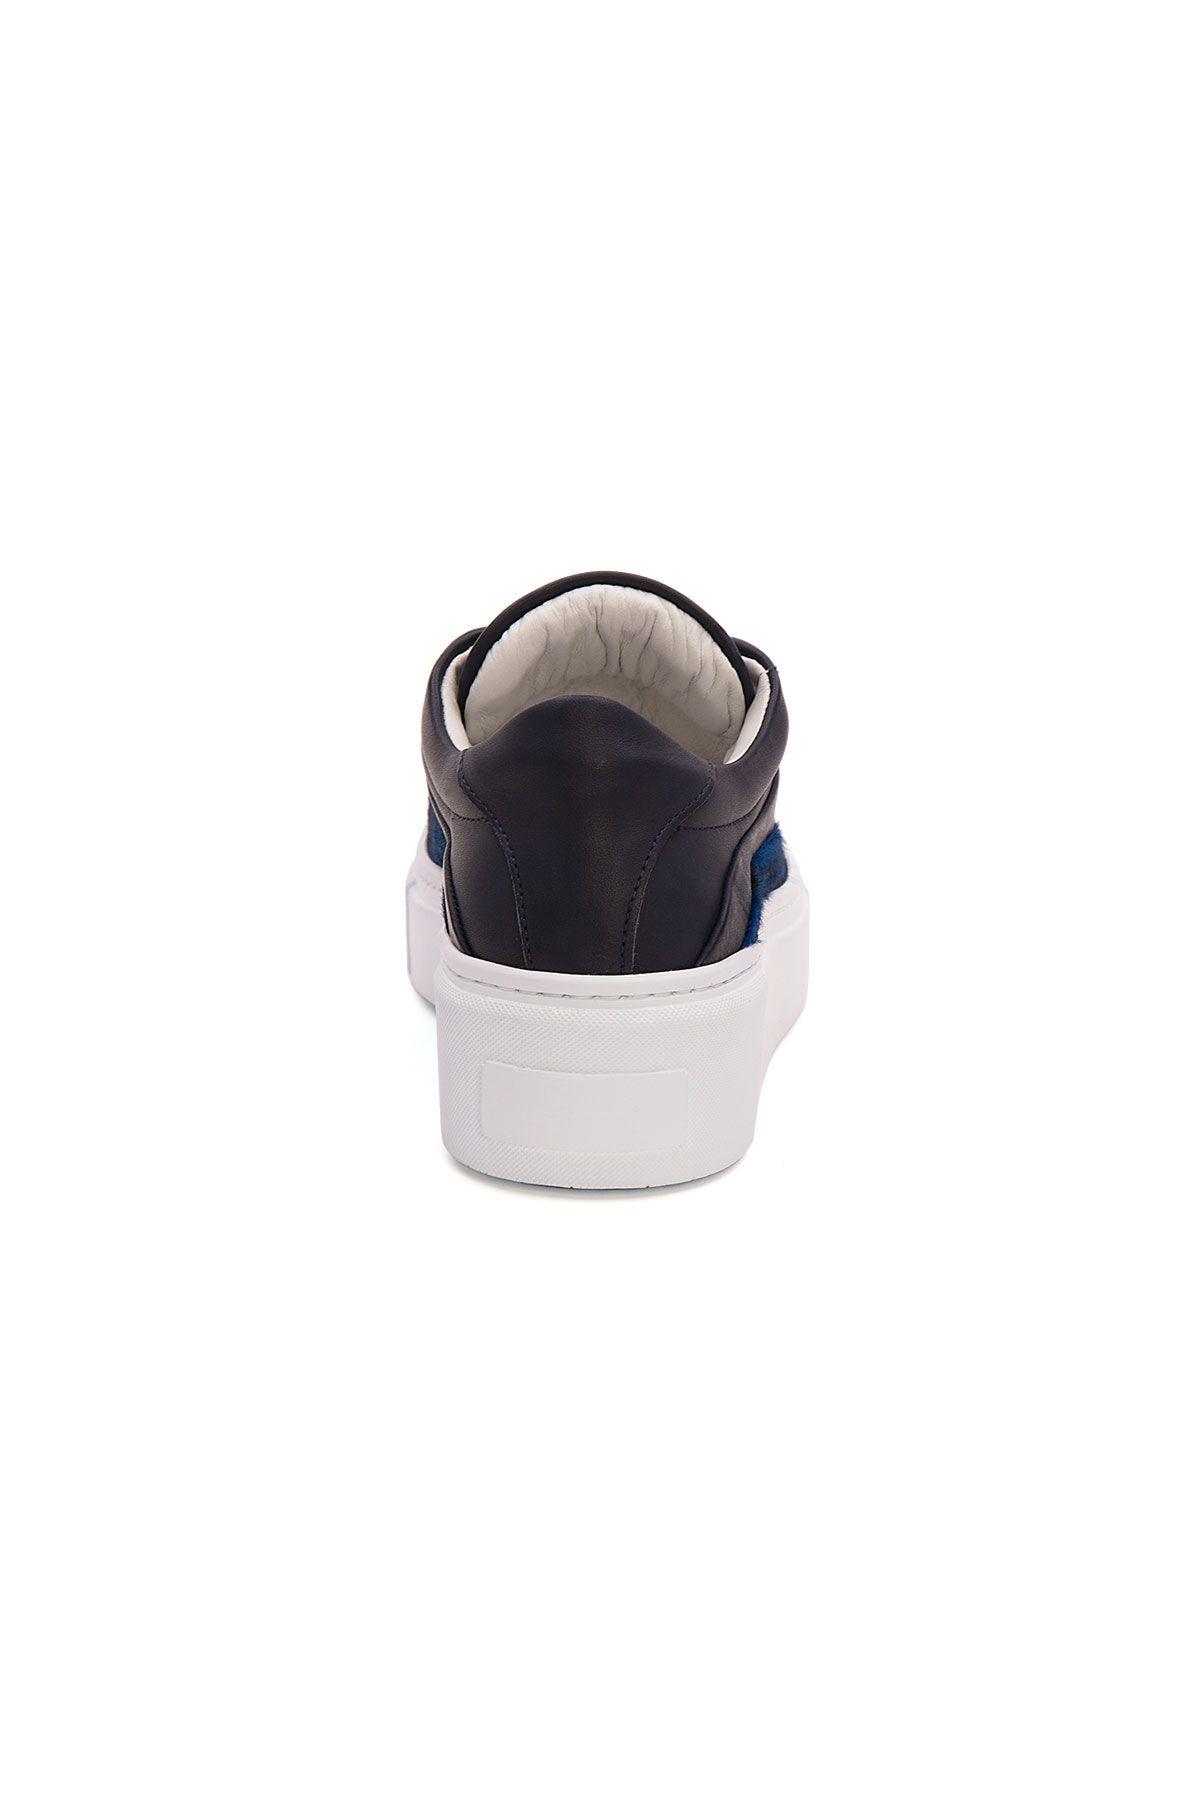 Pegia Genuine Leather Women's Sneaker LA1616 Navy blue